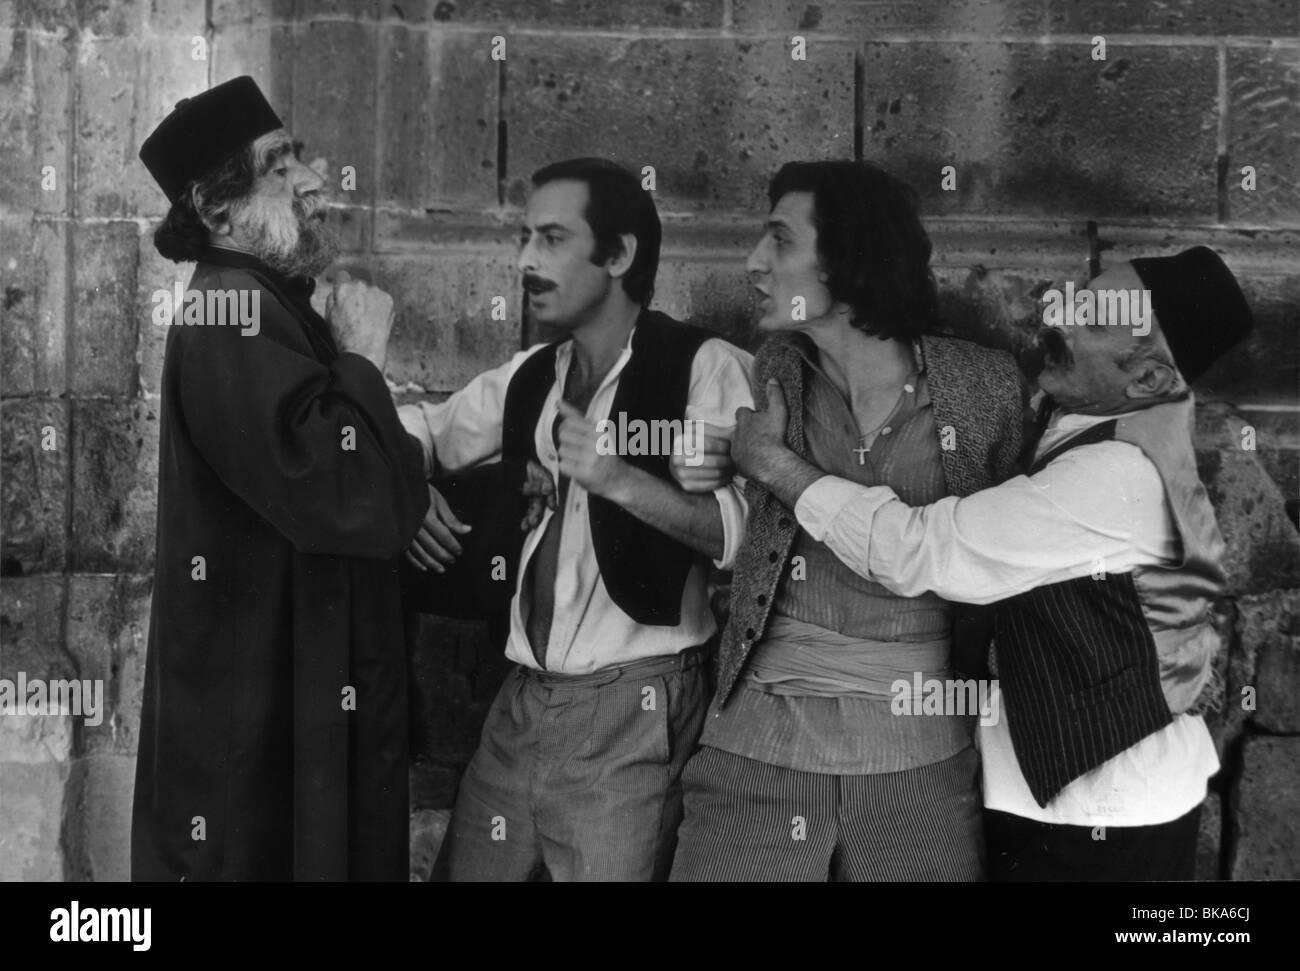 Ktor me yerkinq Year : 1980 Director : Henrik Malyan, Guenrikh Malian Ashot Adamyan - Stock Image